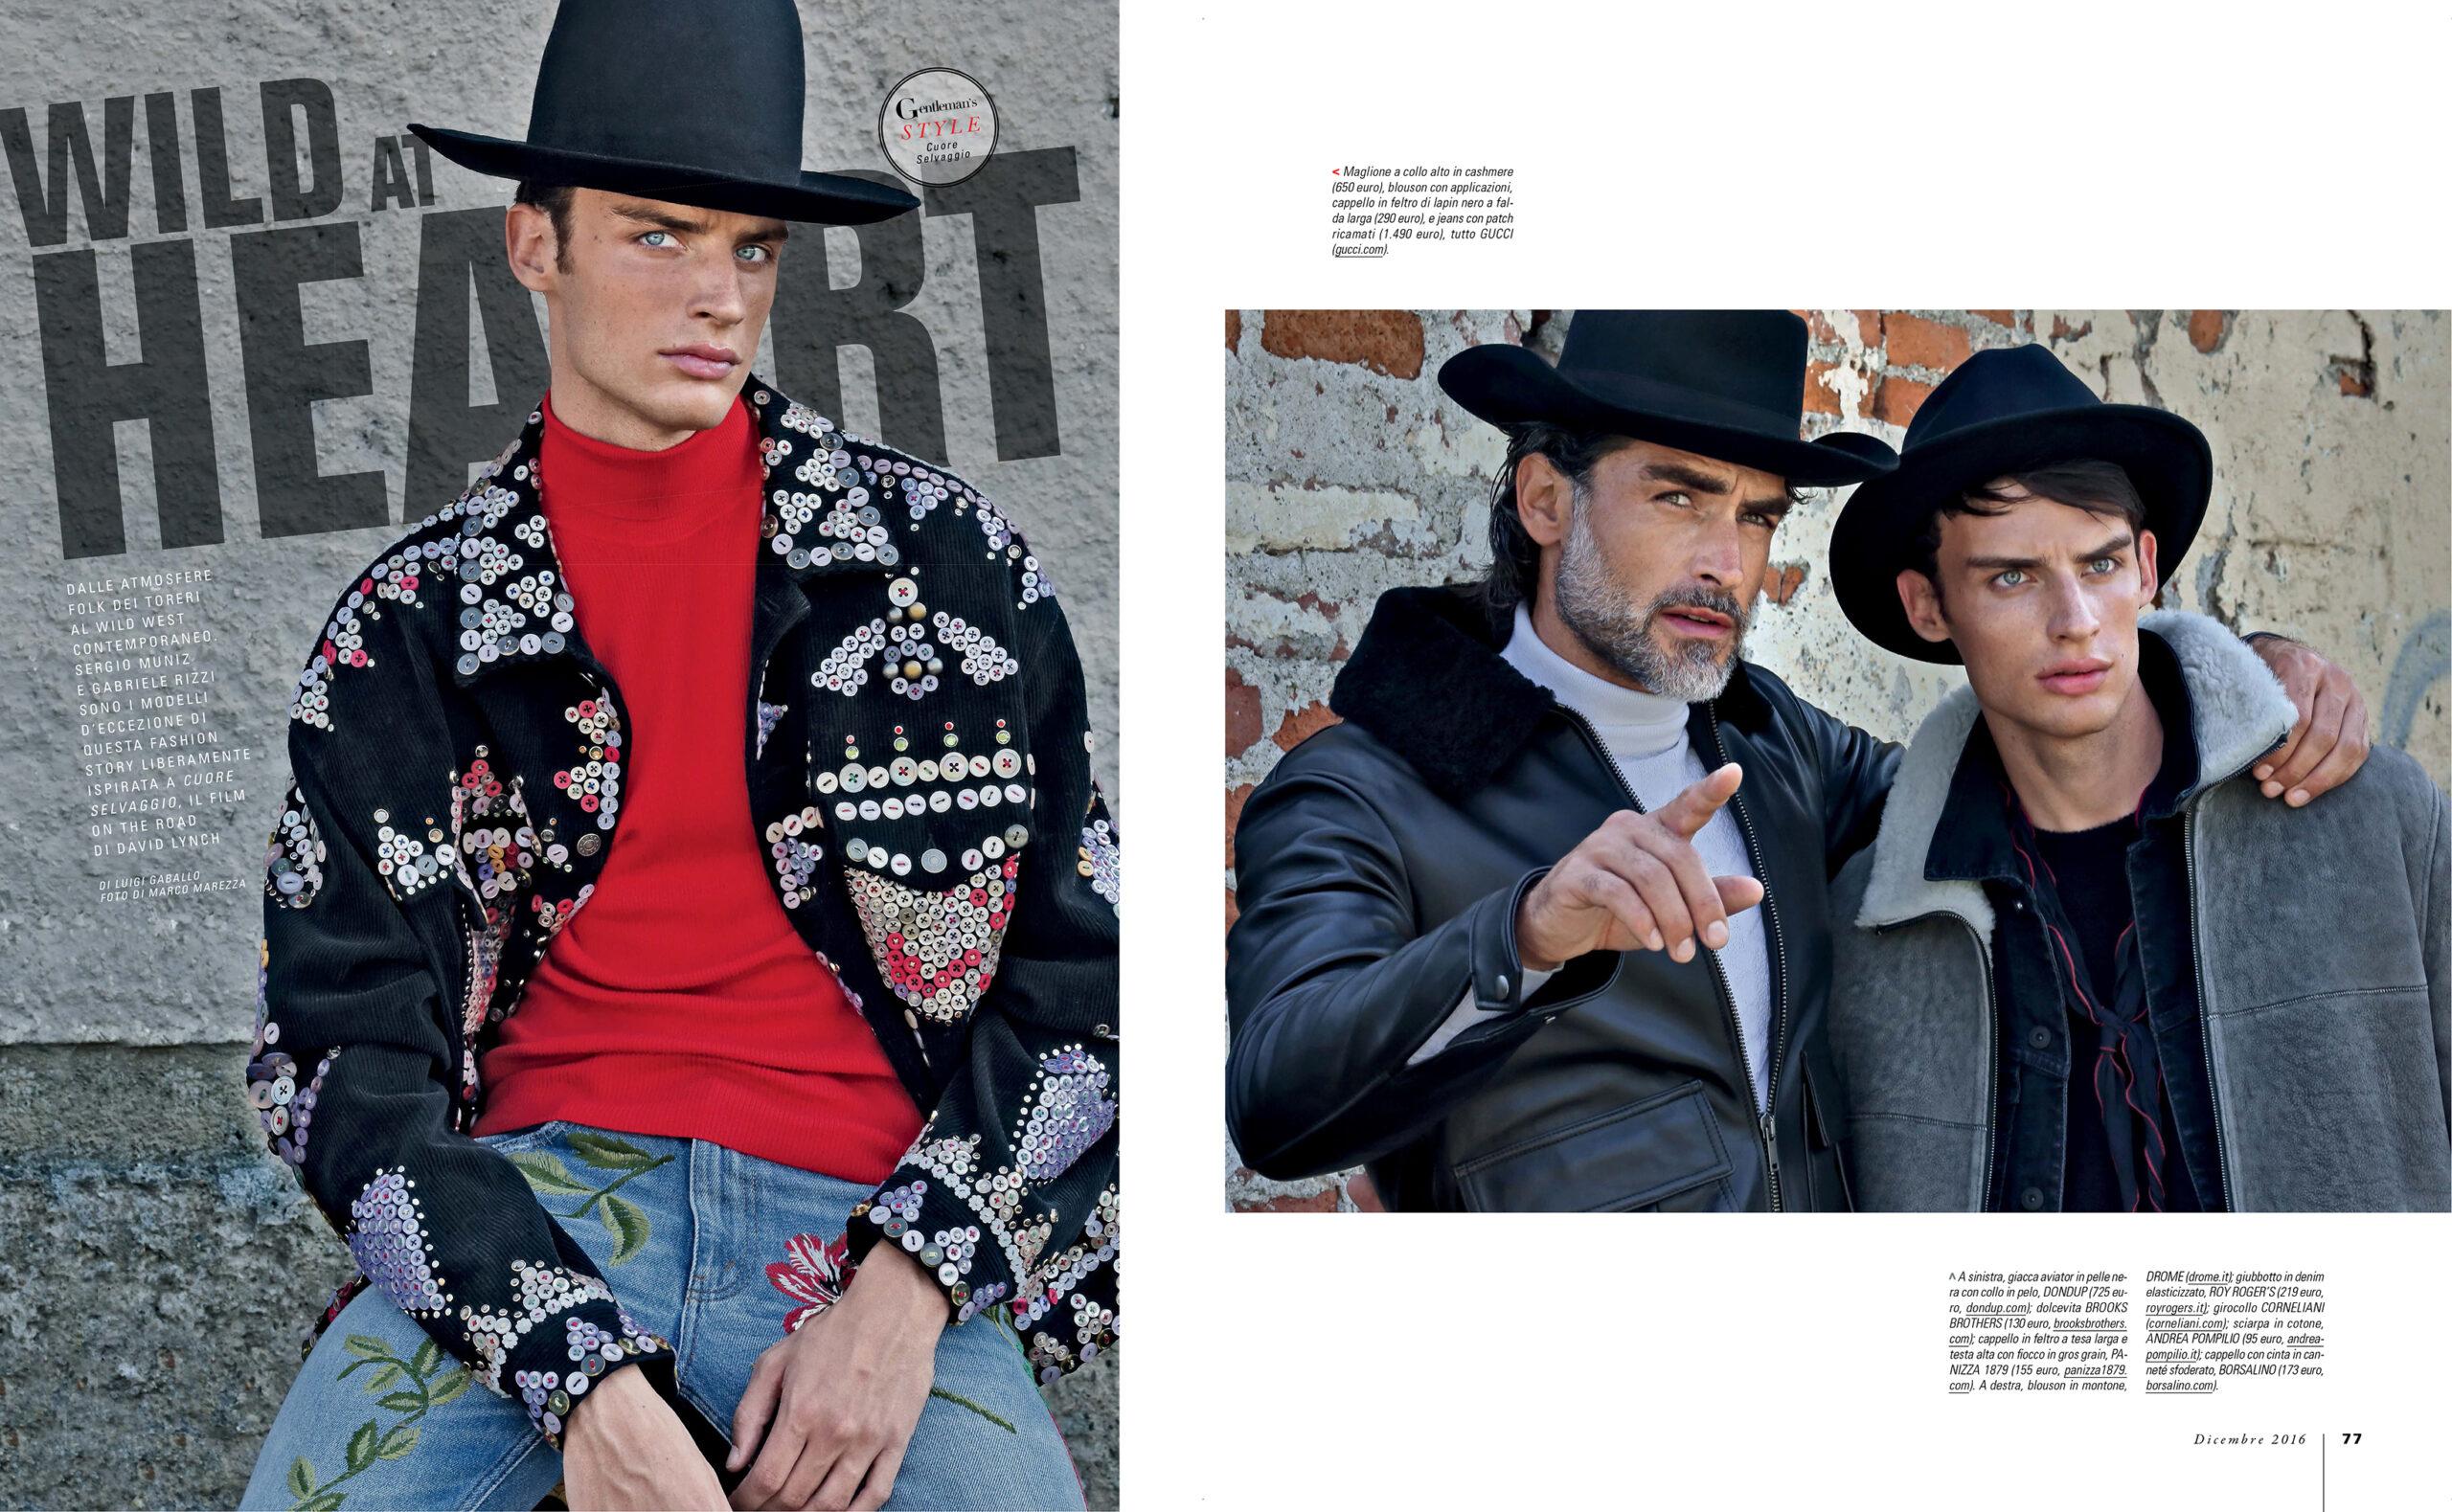 Gentleman Magazine Italia – Wild at Heart